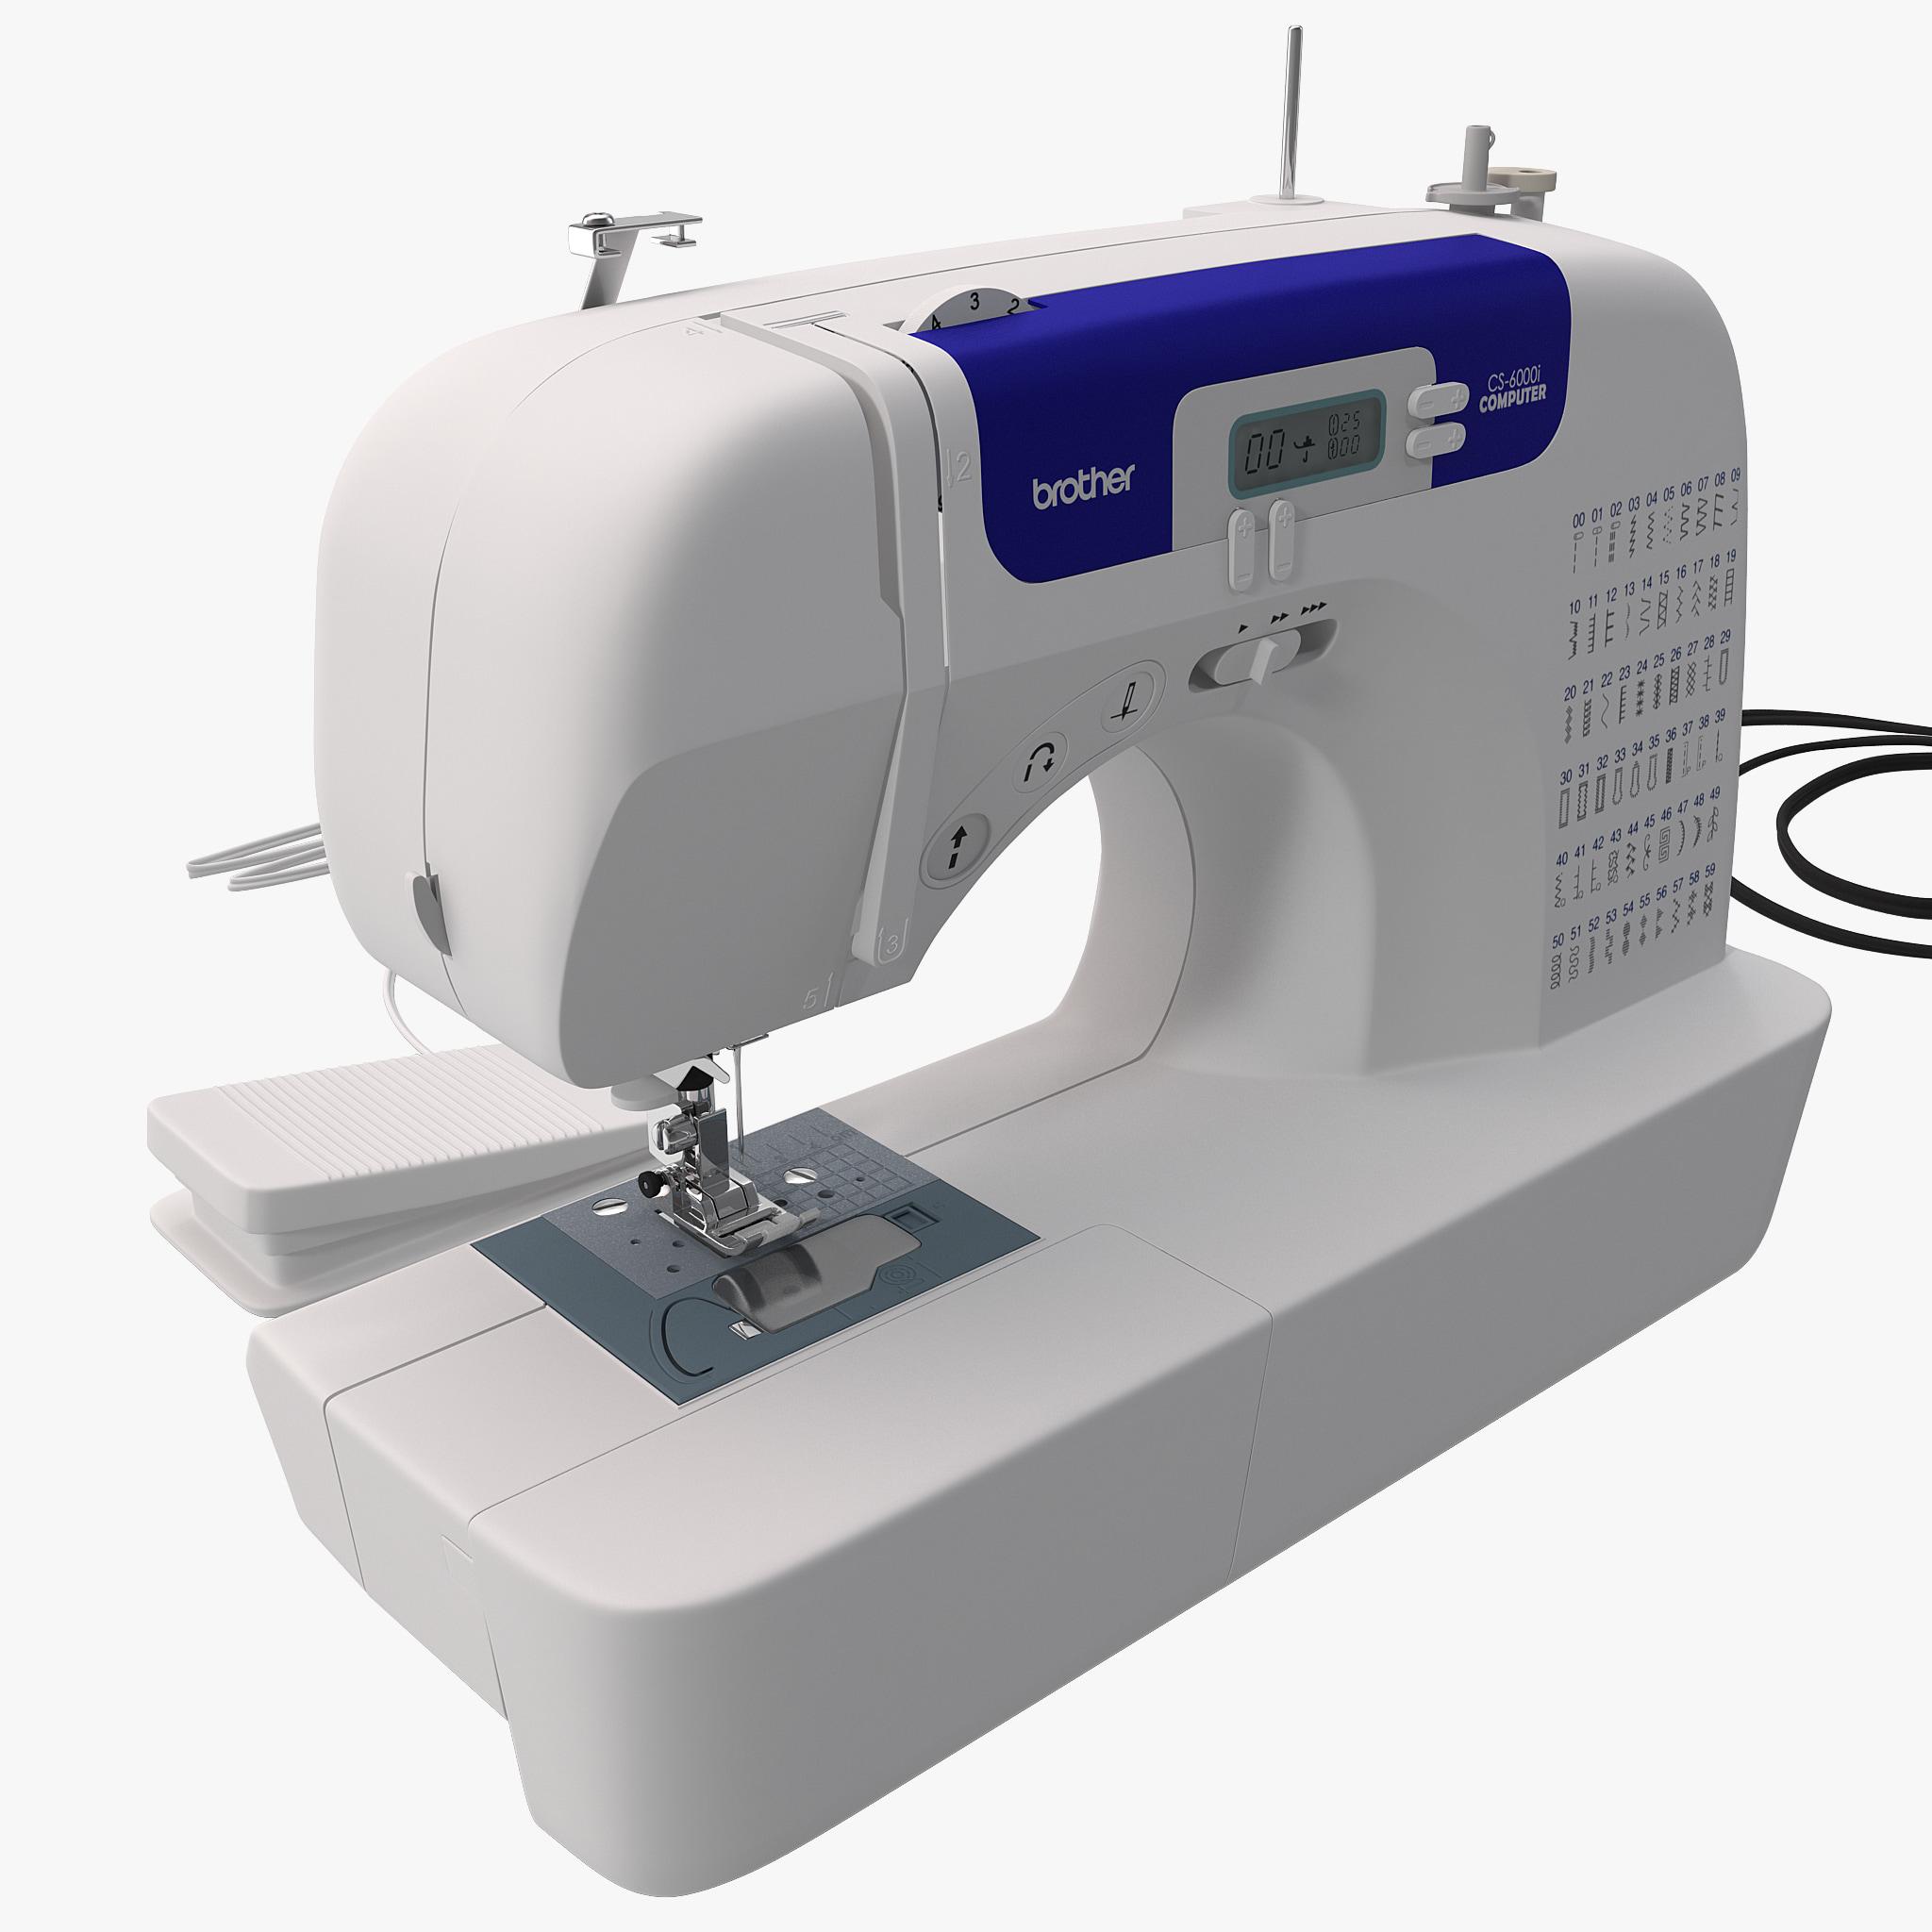 Sewing Machine Brother CS-6000i_1.jpg